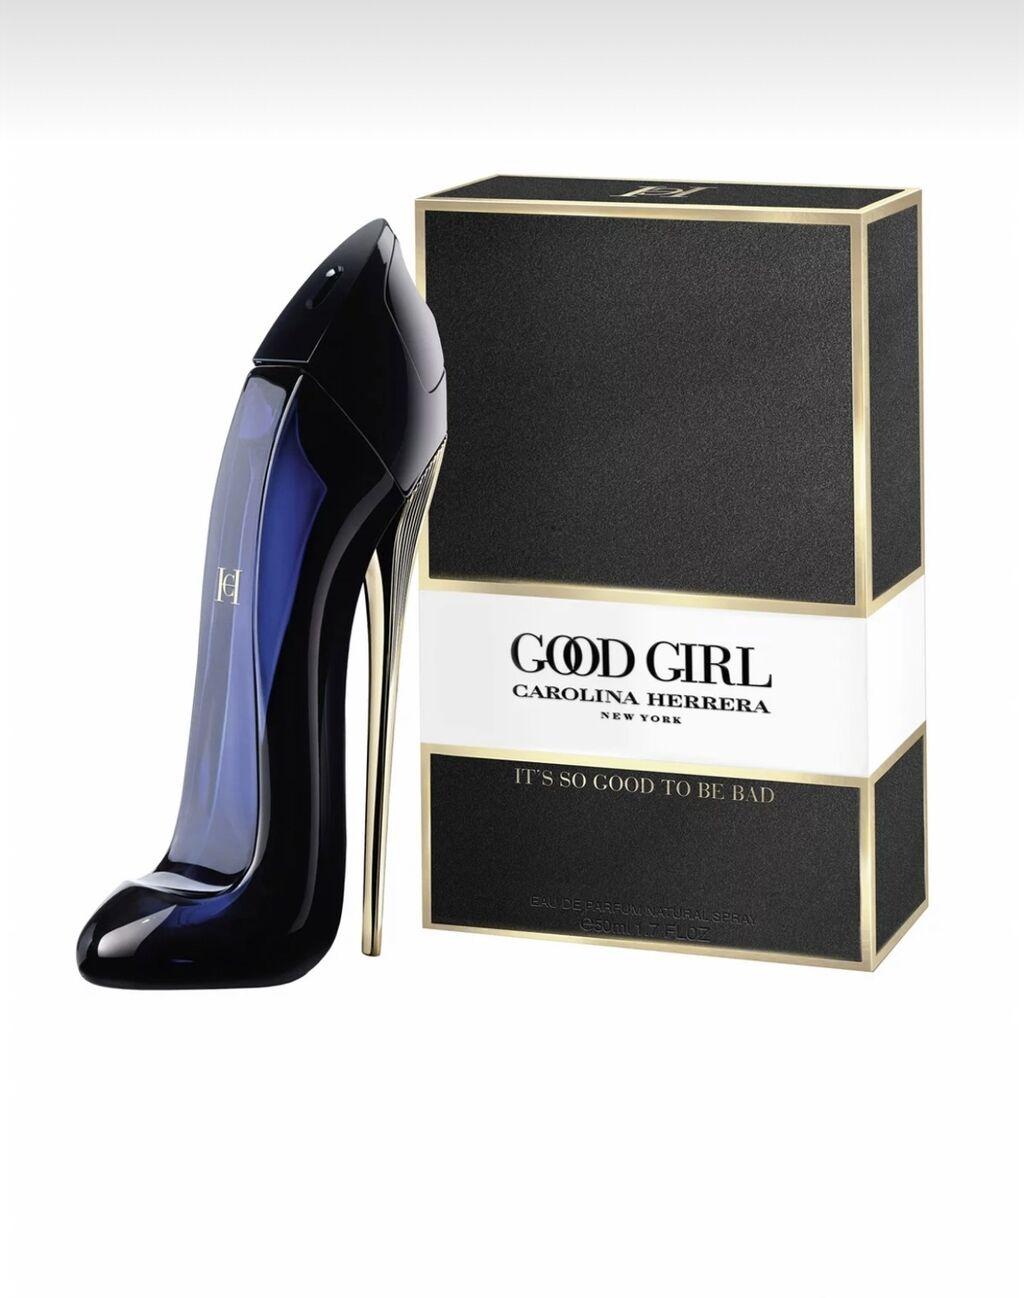 KOD: 1659 Carolina Herrera good girl 50ml, 32% endirimlə